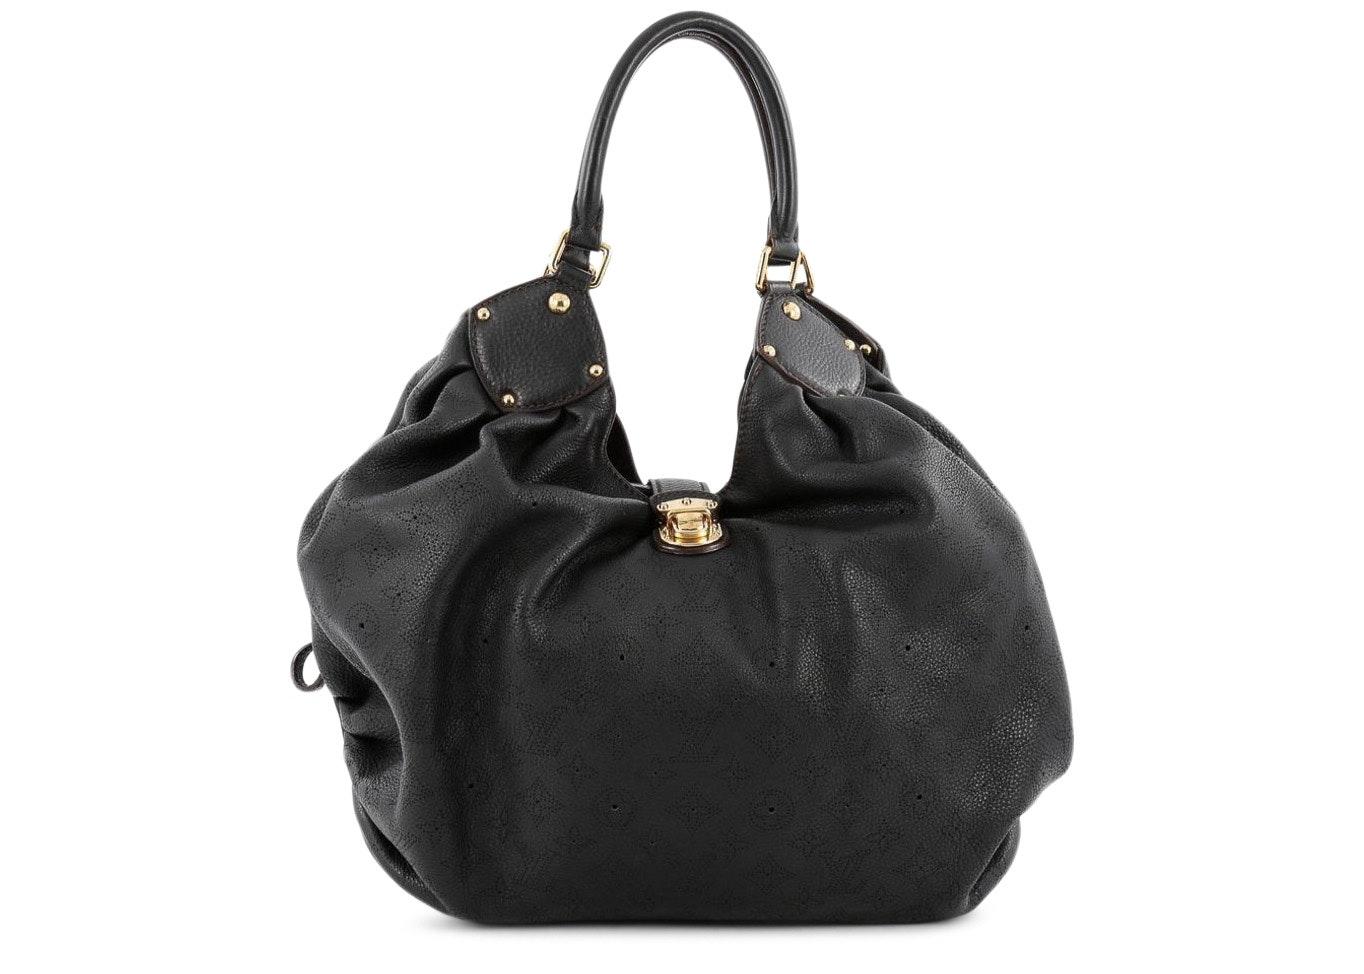 Louis Vuitton L Hobo Monogram Mahina Black